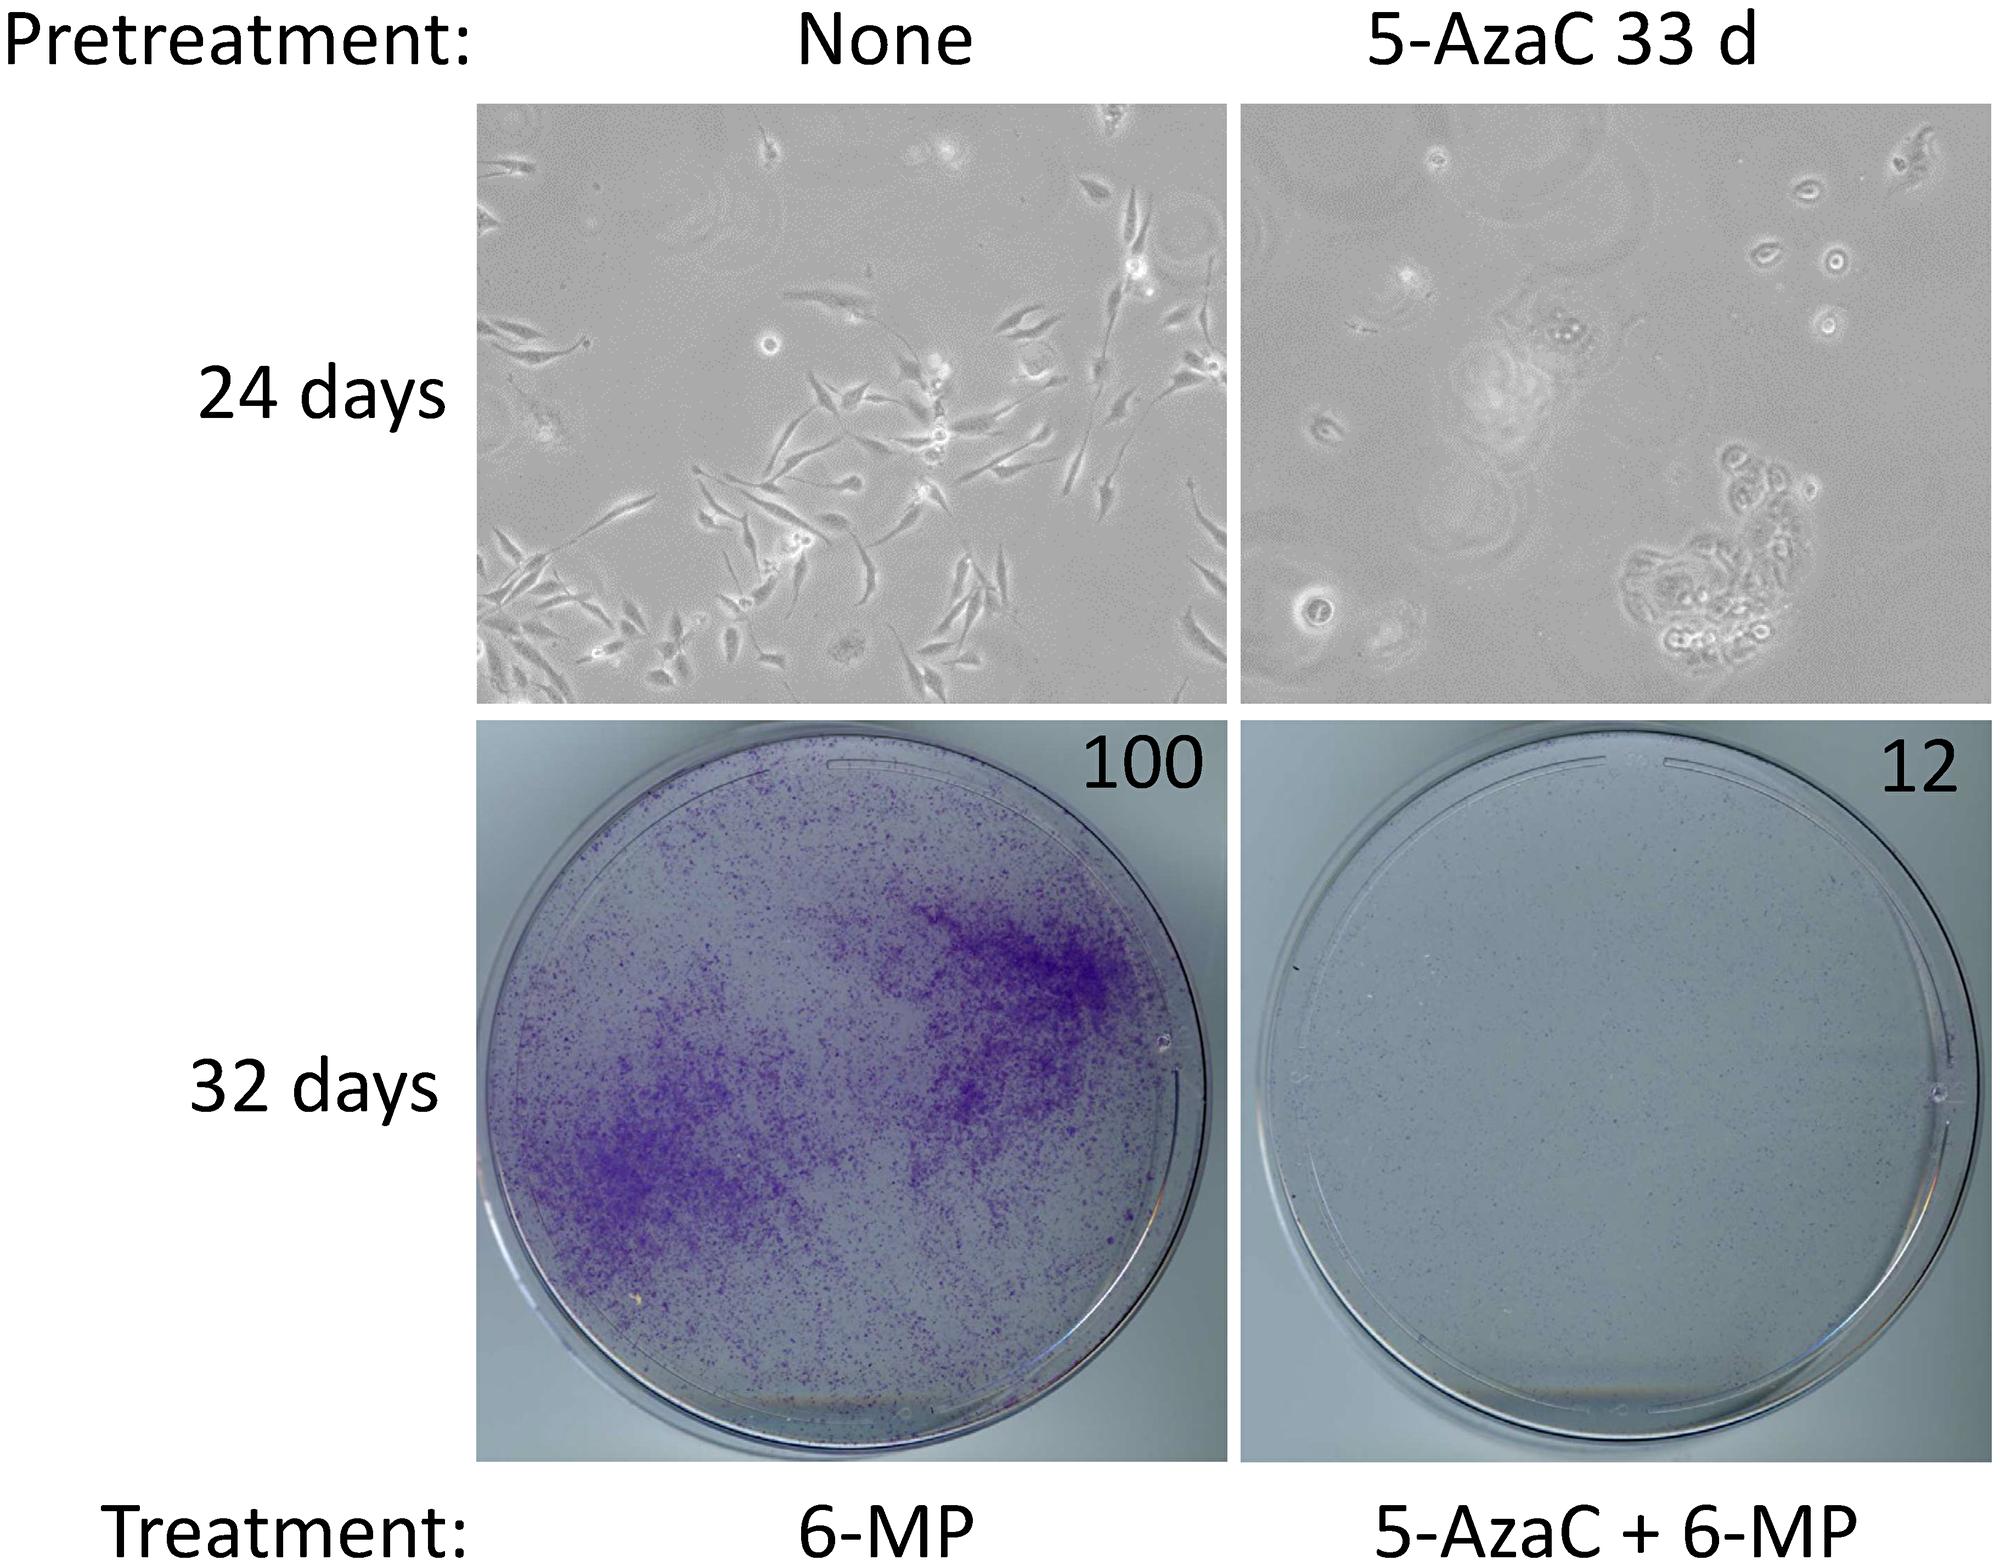 5-AzaC pretreatment sensitizes SUM149-MA cells to low-dose 6-MP.